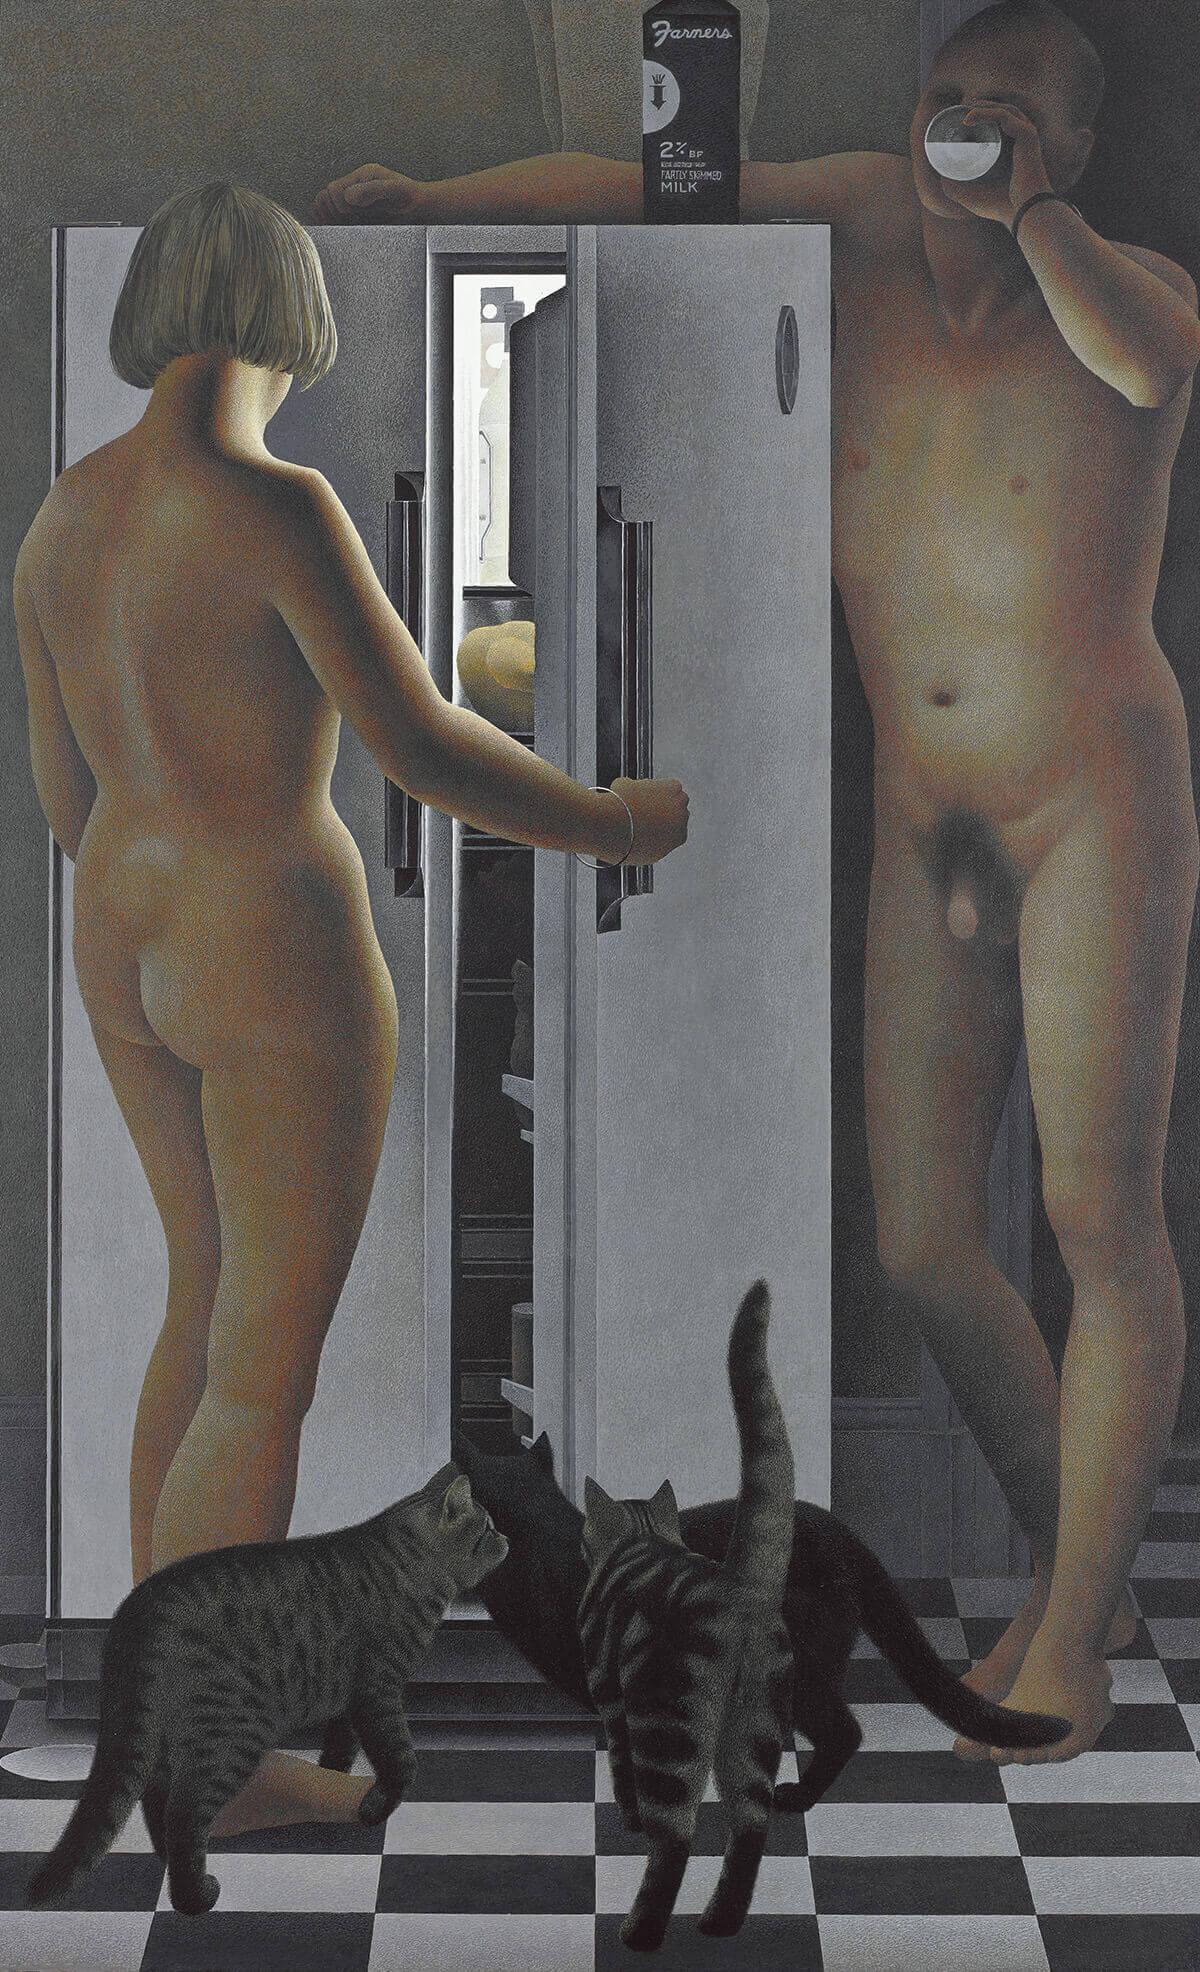 Alex Colville,Refrigerator, 1977